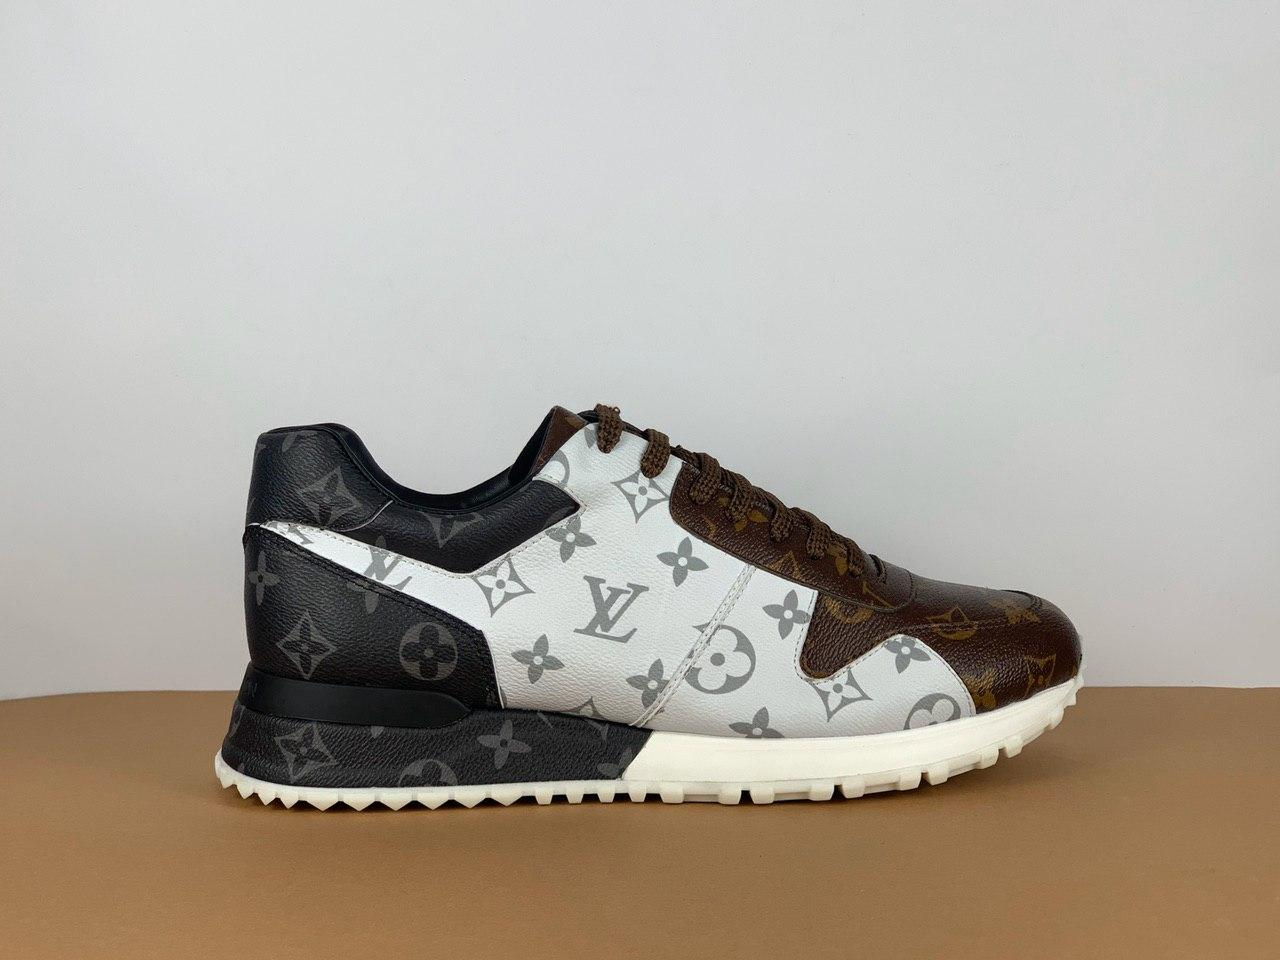 Кожаные кроссовки Louis Vuitton RUN AWAY (Луи Виттон) арт. 39-161